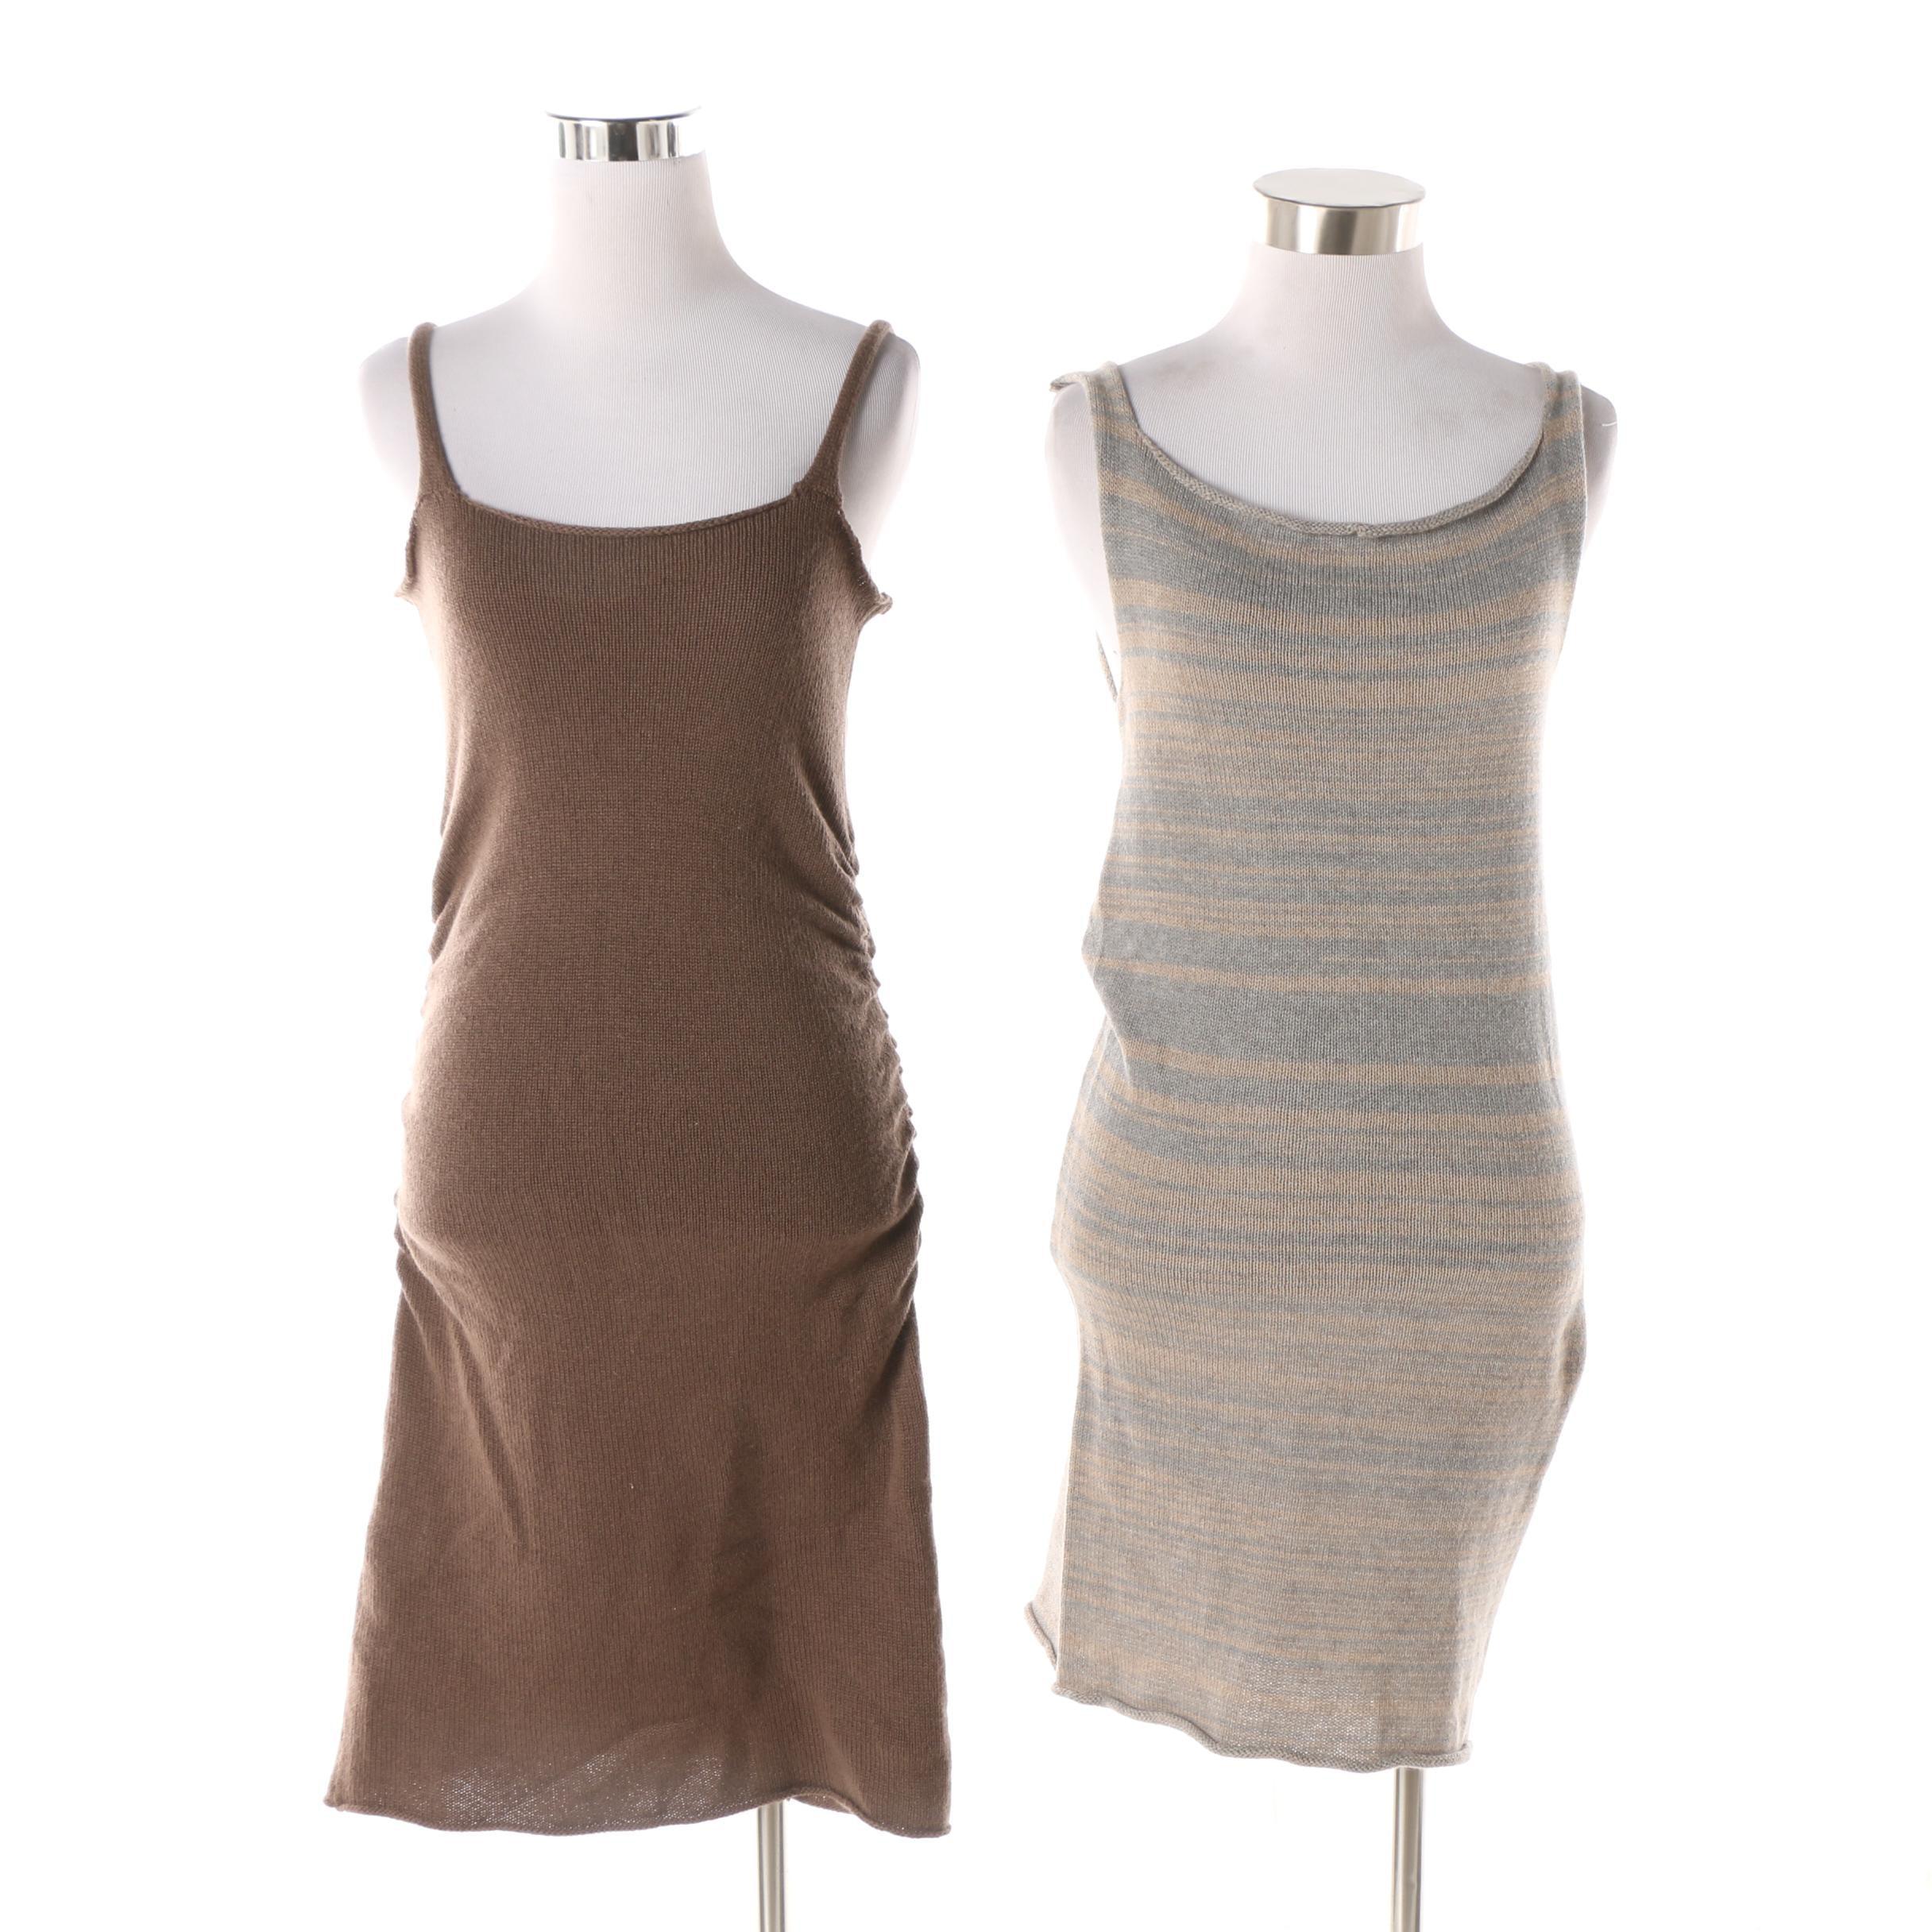 Women's Souchi Merino Wool Blend and Cashmere Knit Sleeveless Mini Dresses